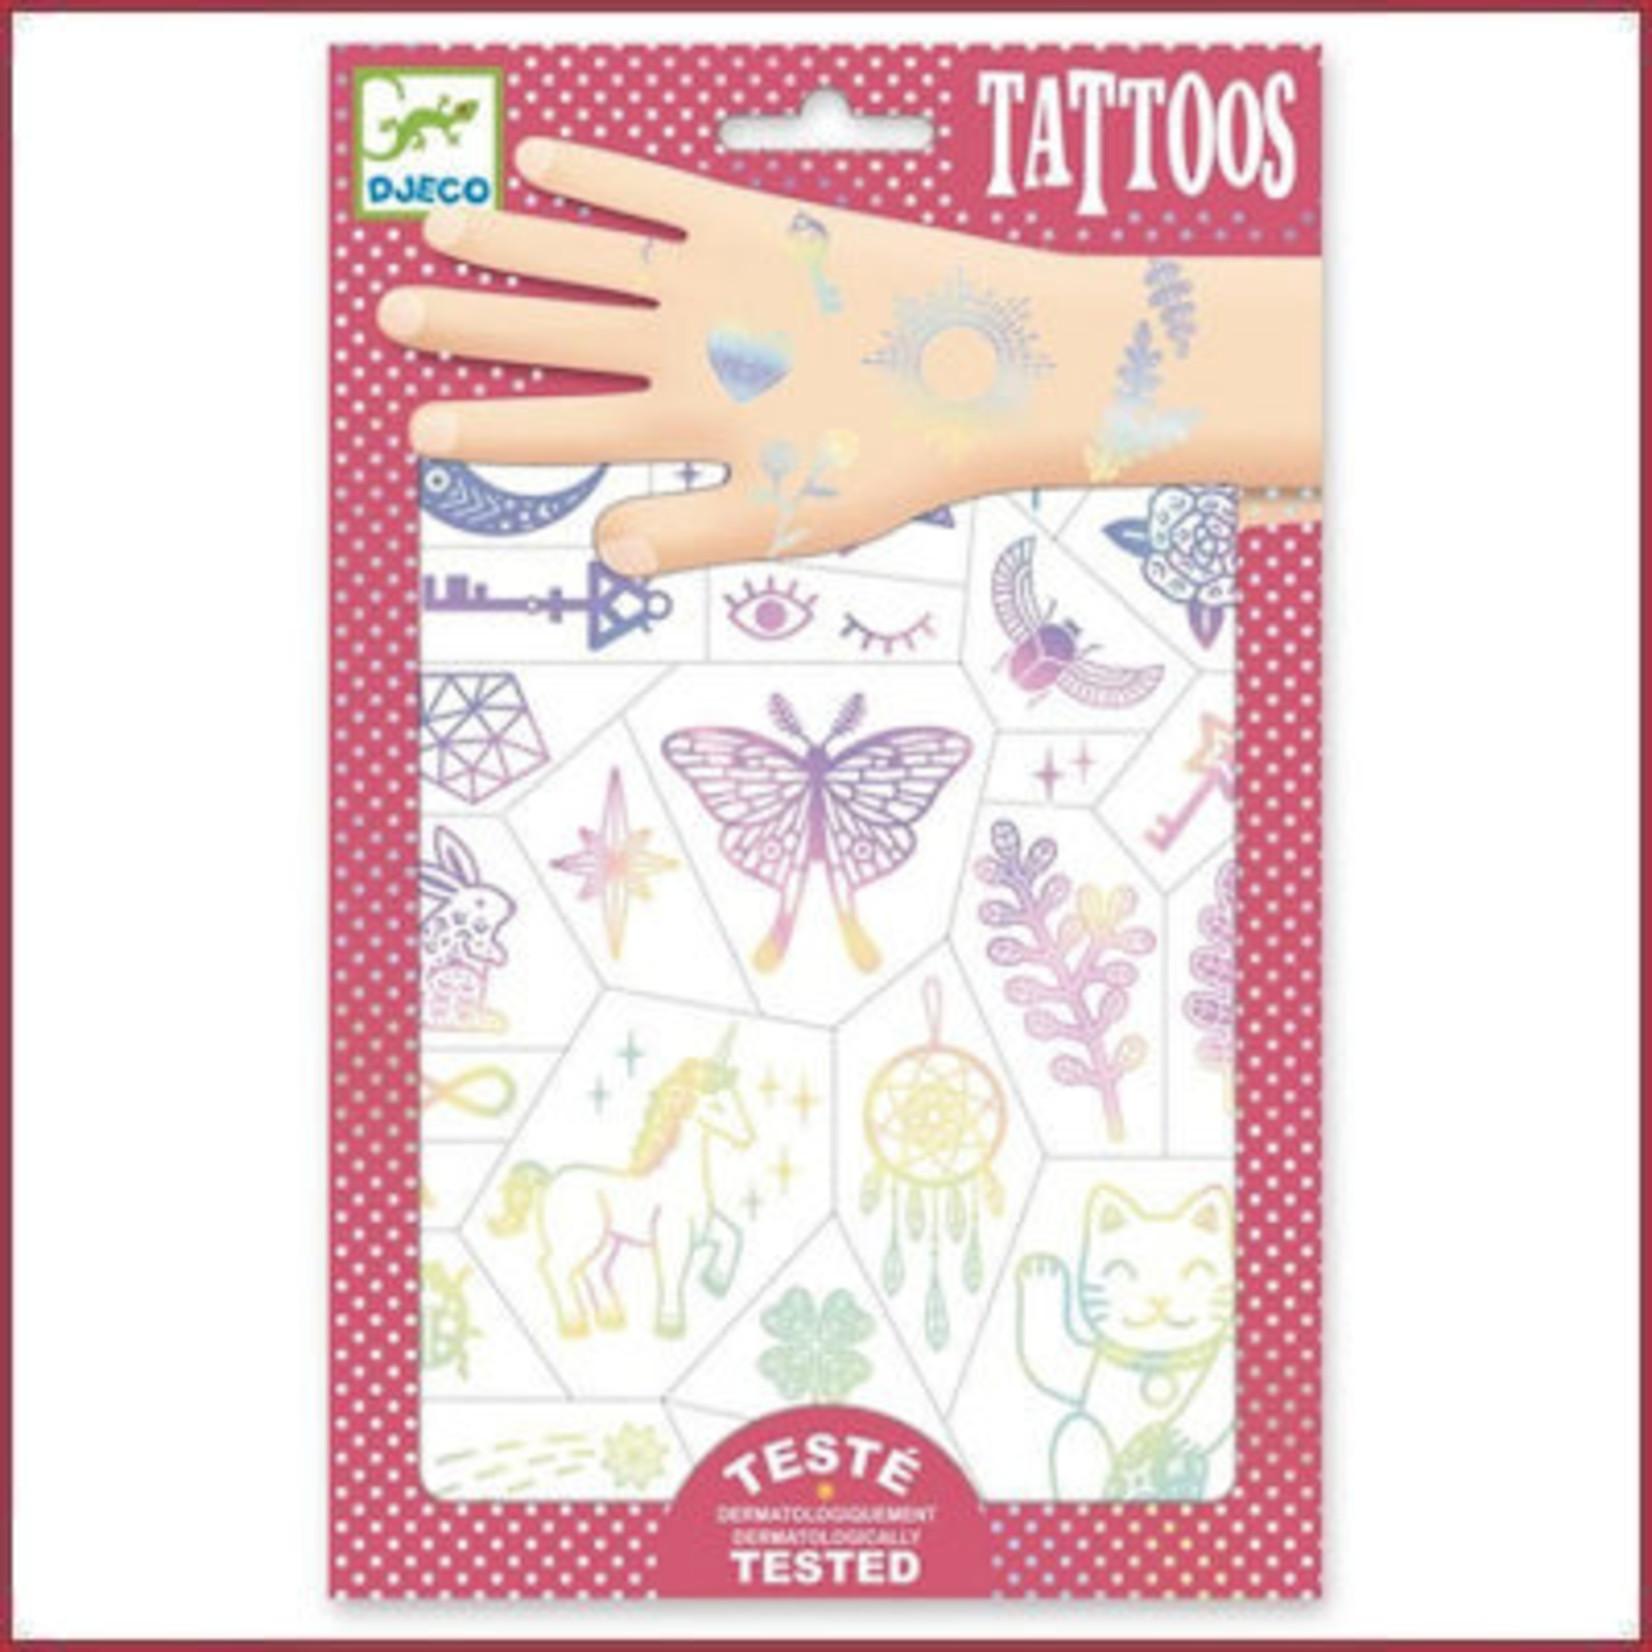 Djeco Tattoos Lucky Charms